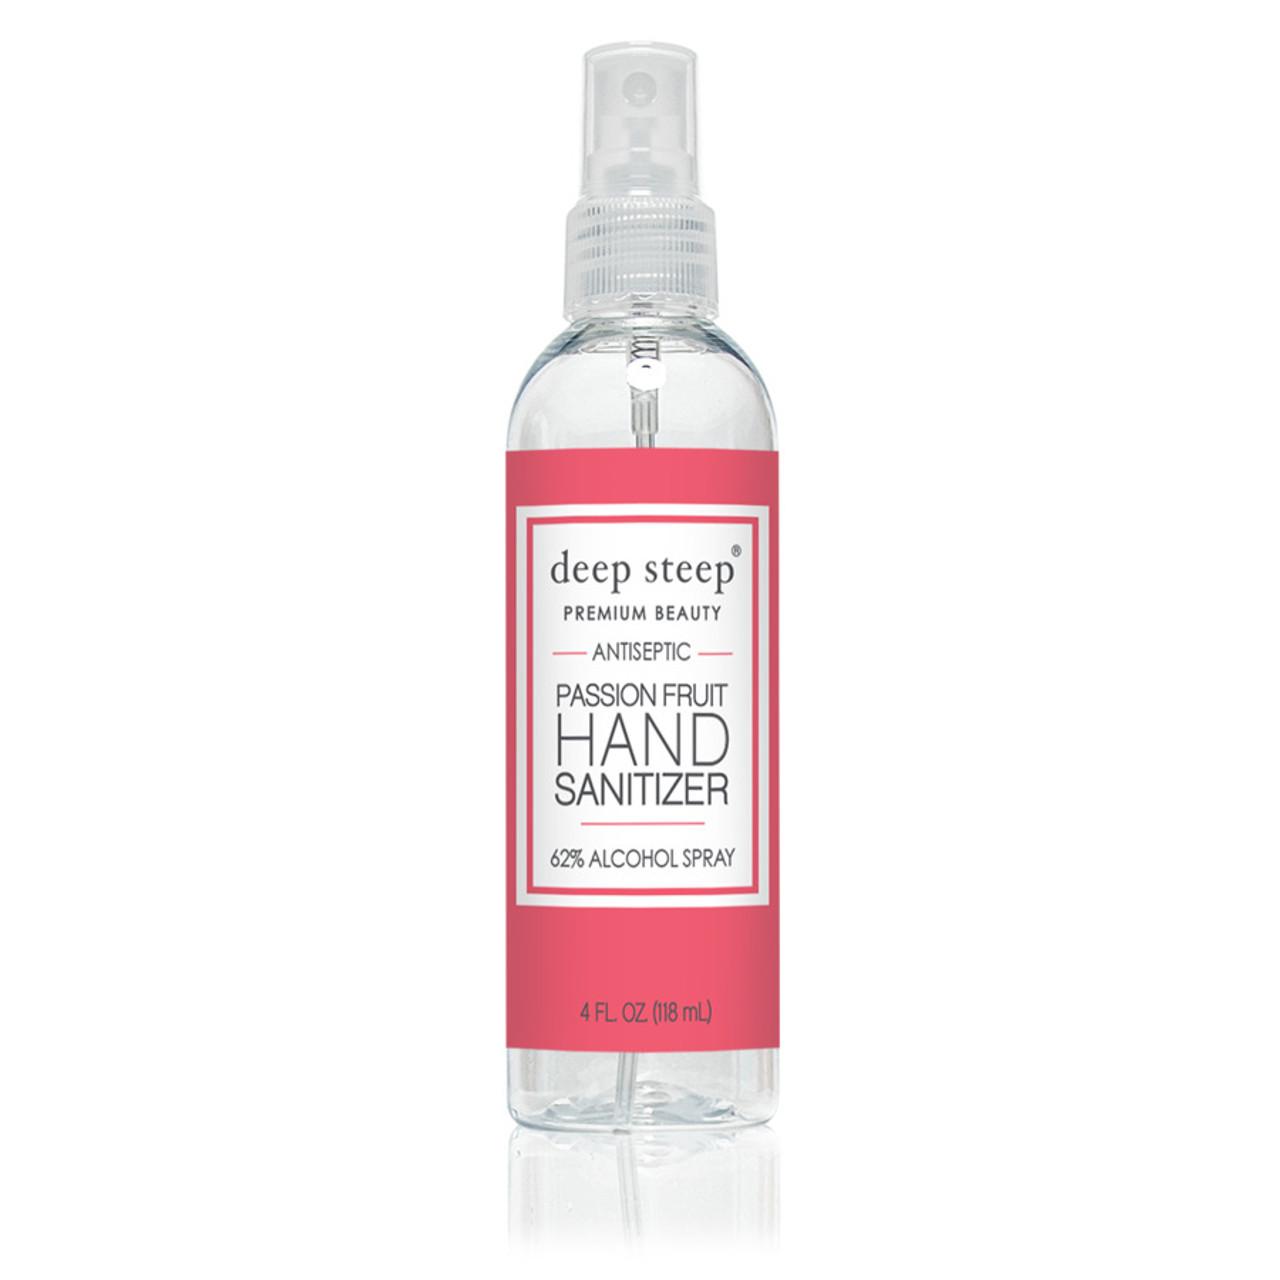 Hand Sanitizer Spray, Passion Fruit - 4fl oz. - Front